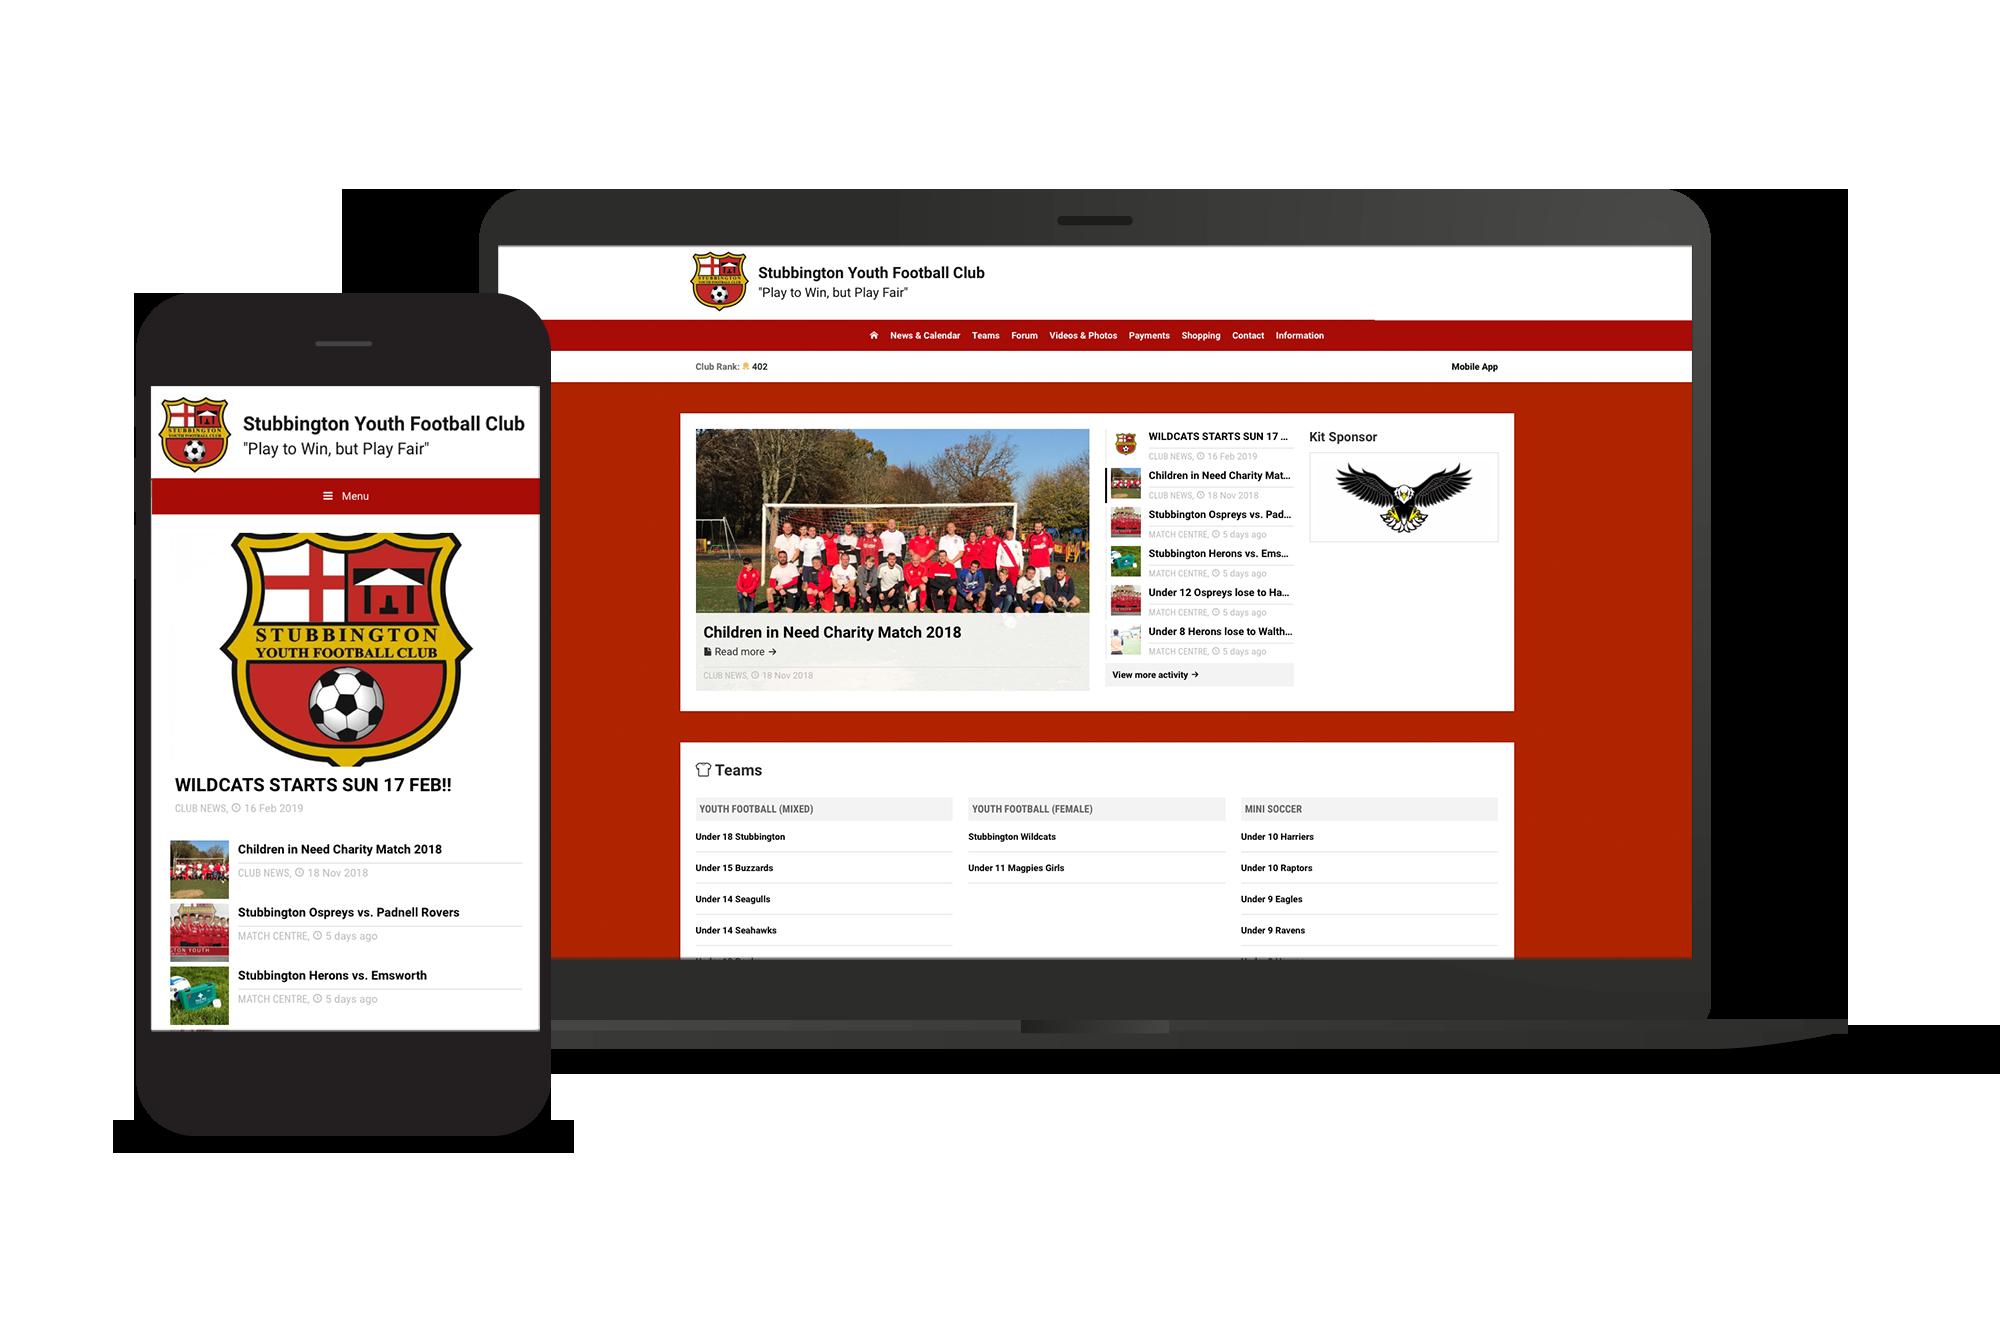 Stubbington Youth Football Club Screens